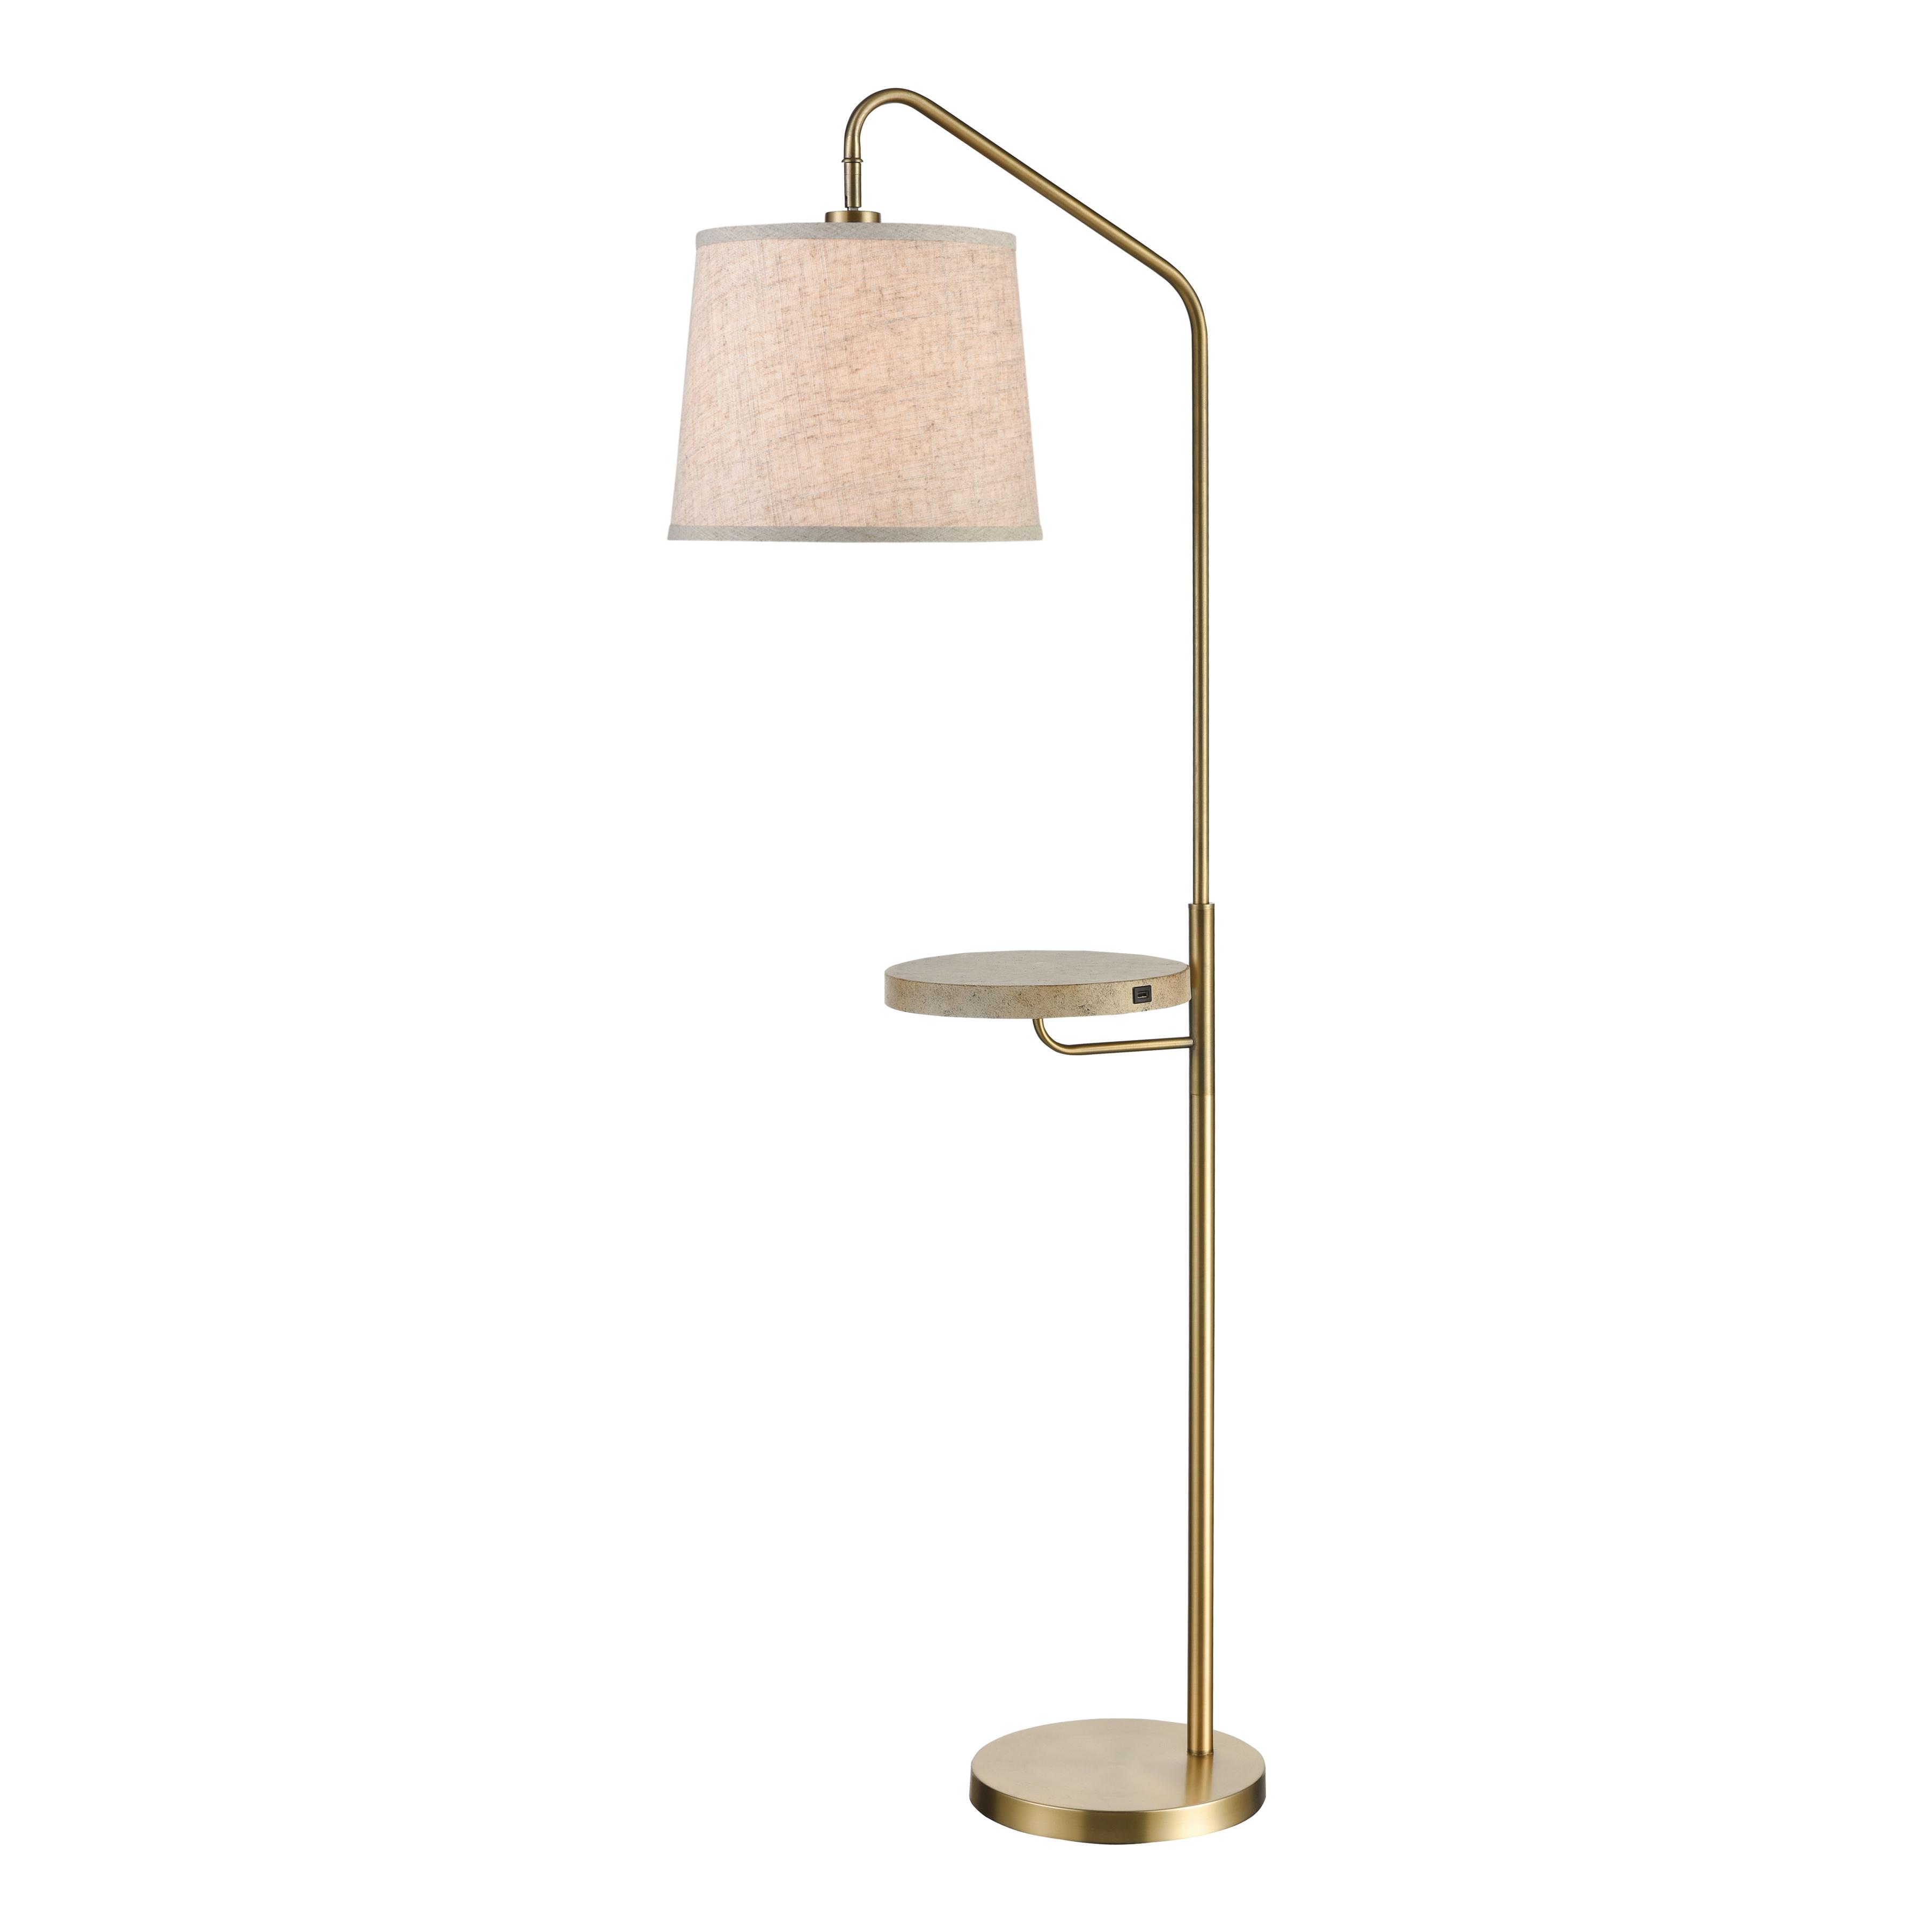 Stein World Regina Floor Lamp/USB Charger